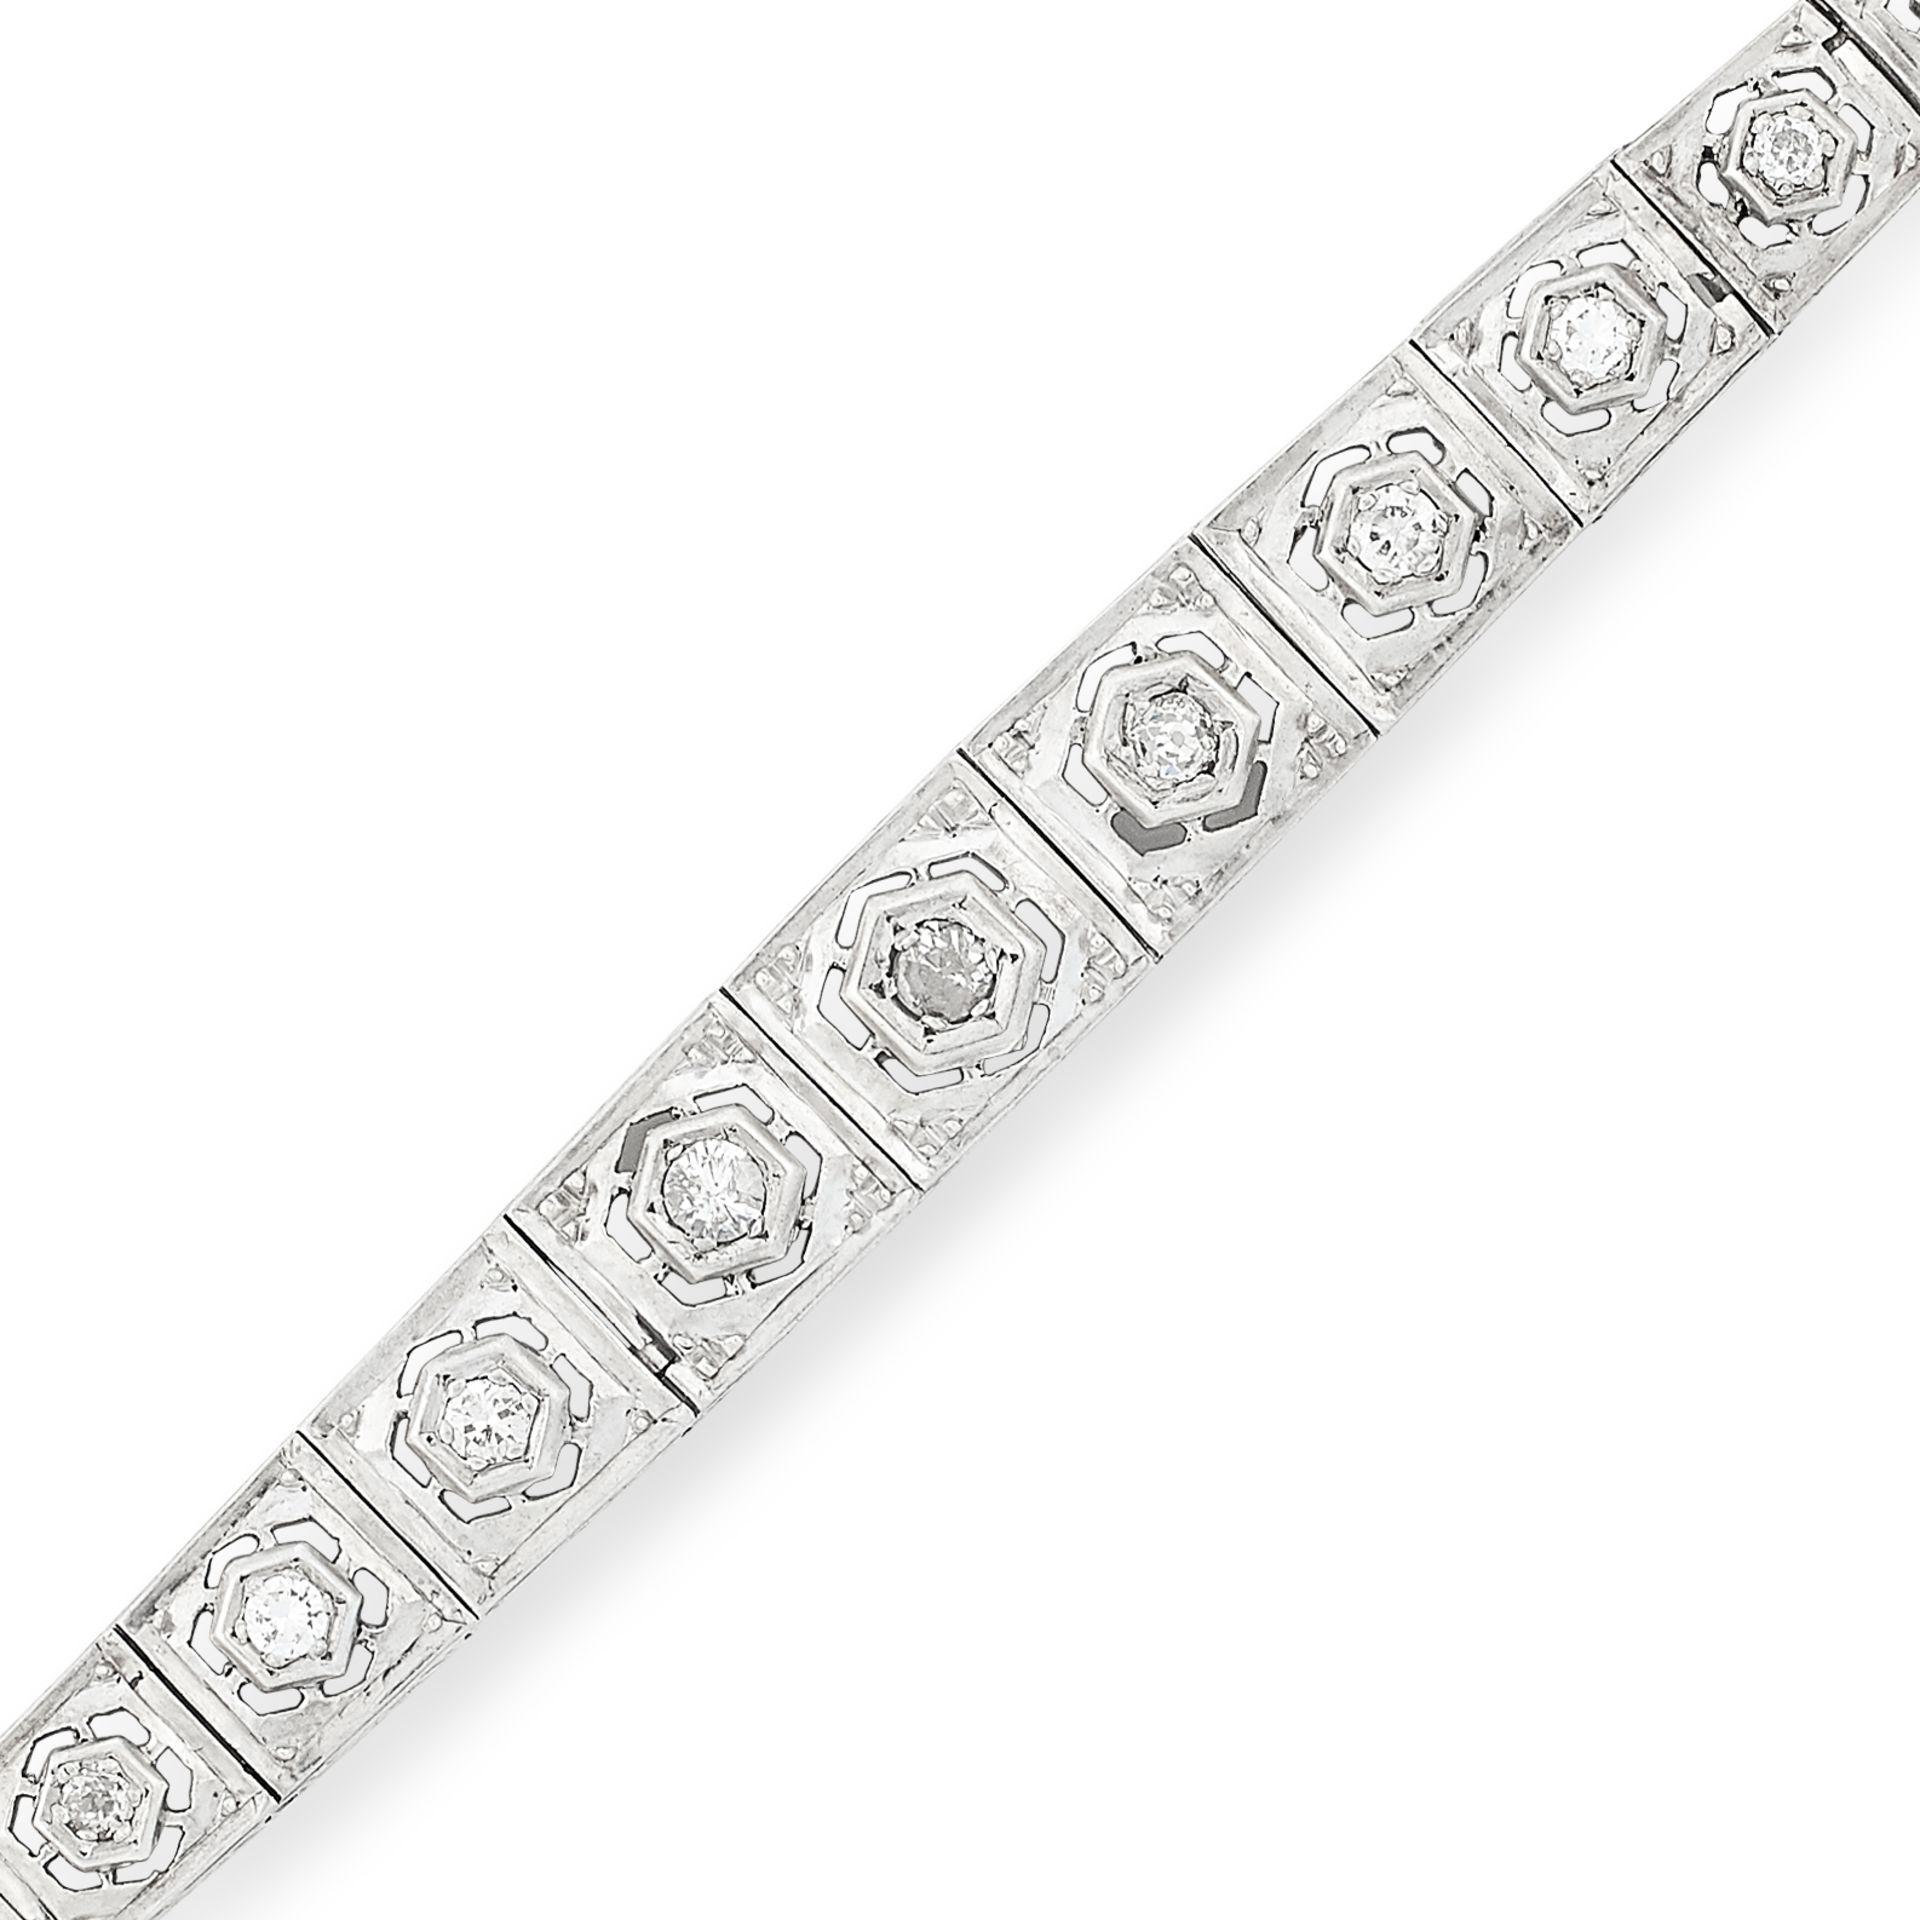 DIAMOND BRACELET in Art Deco style, set with round cut diamonds totalling approximately 1.50 carats, - Bild 2 aus 2